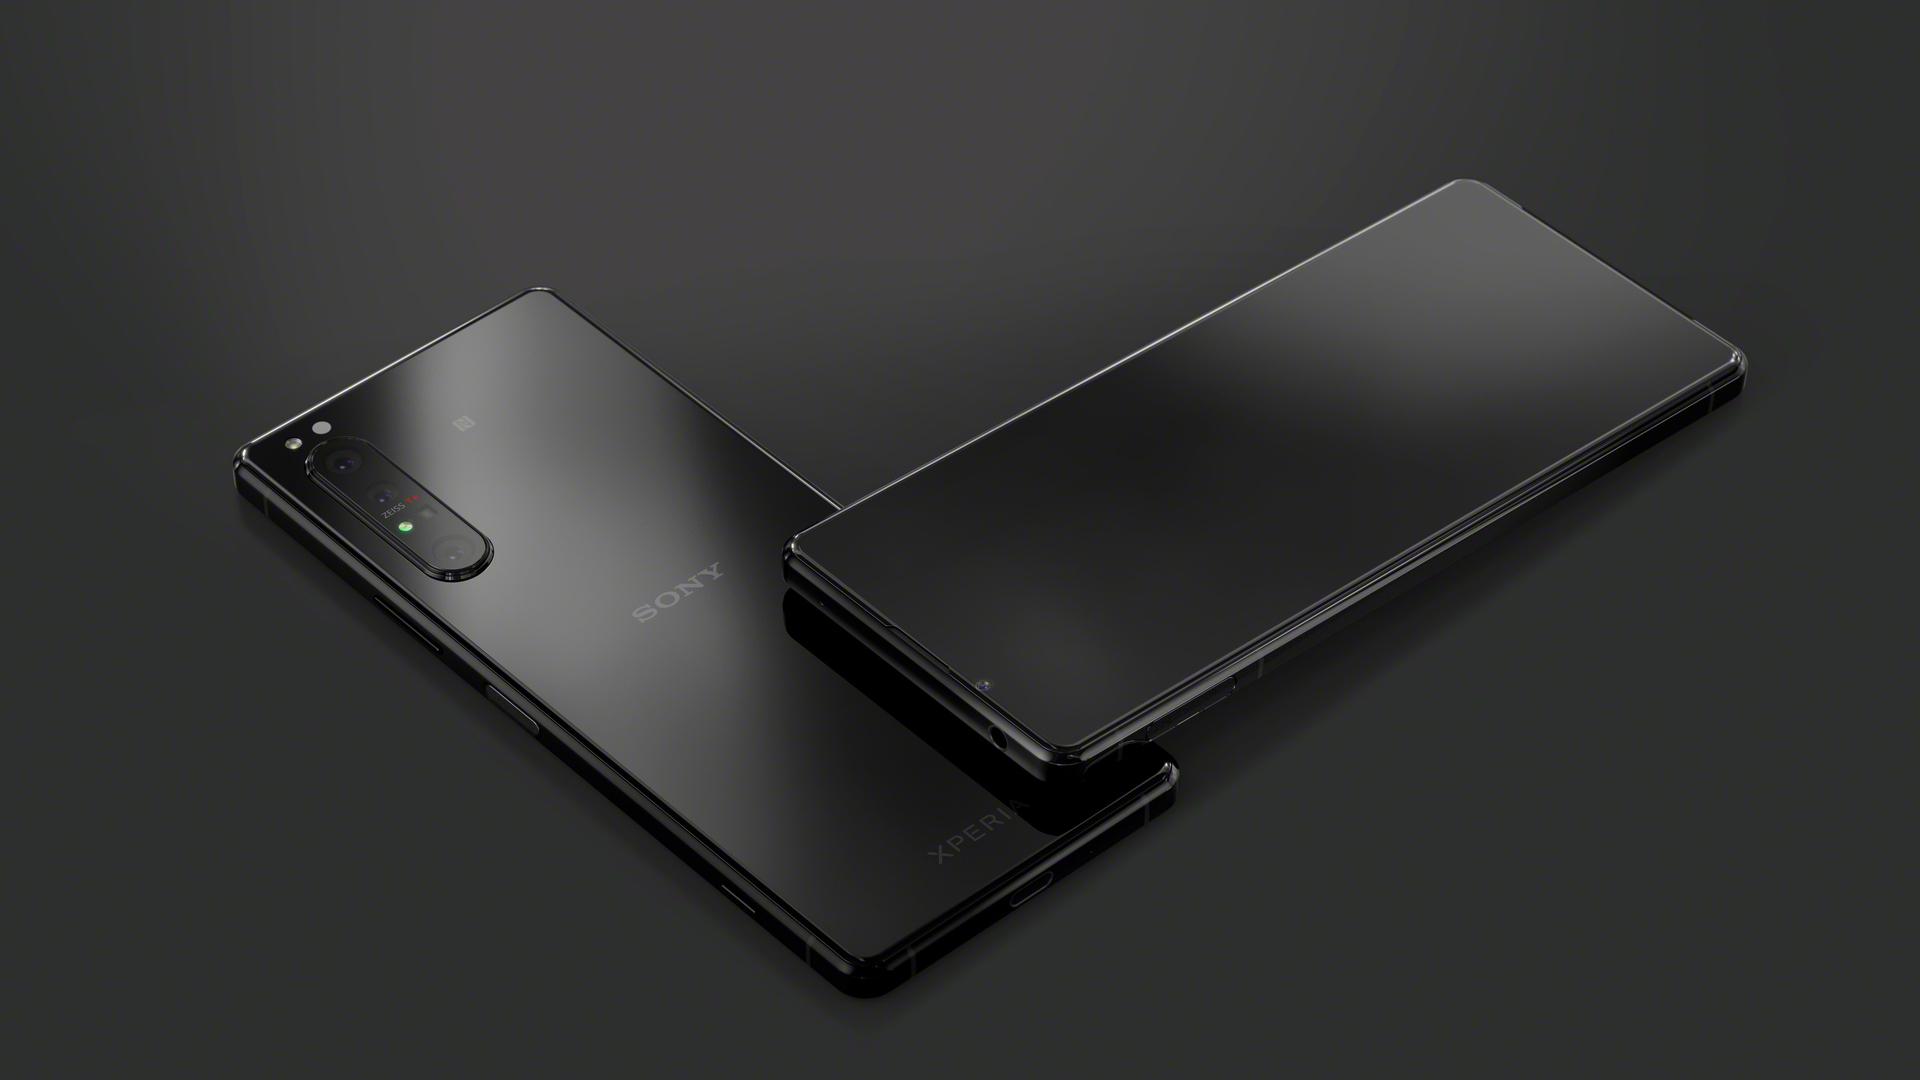 sony xperia 1 ii black back front